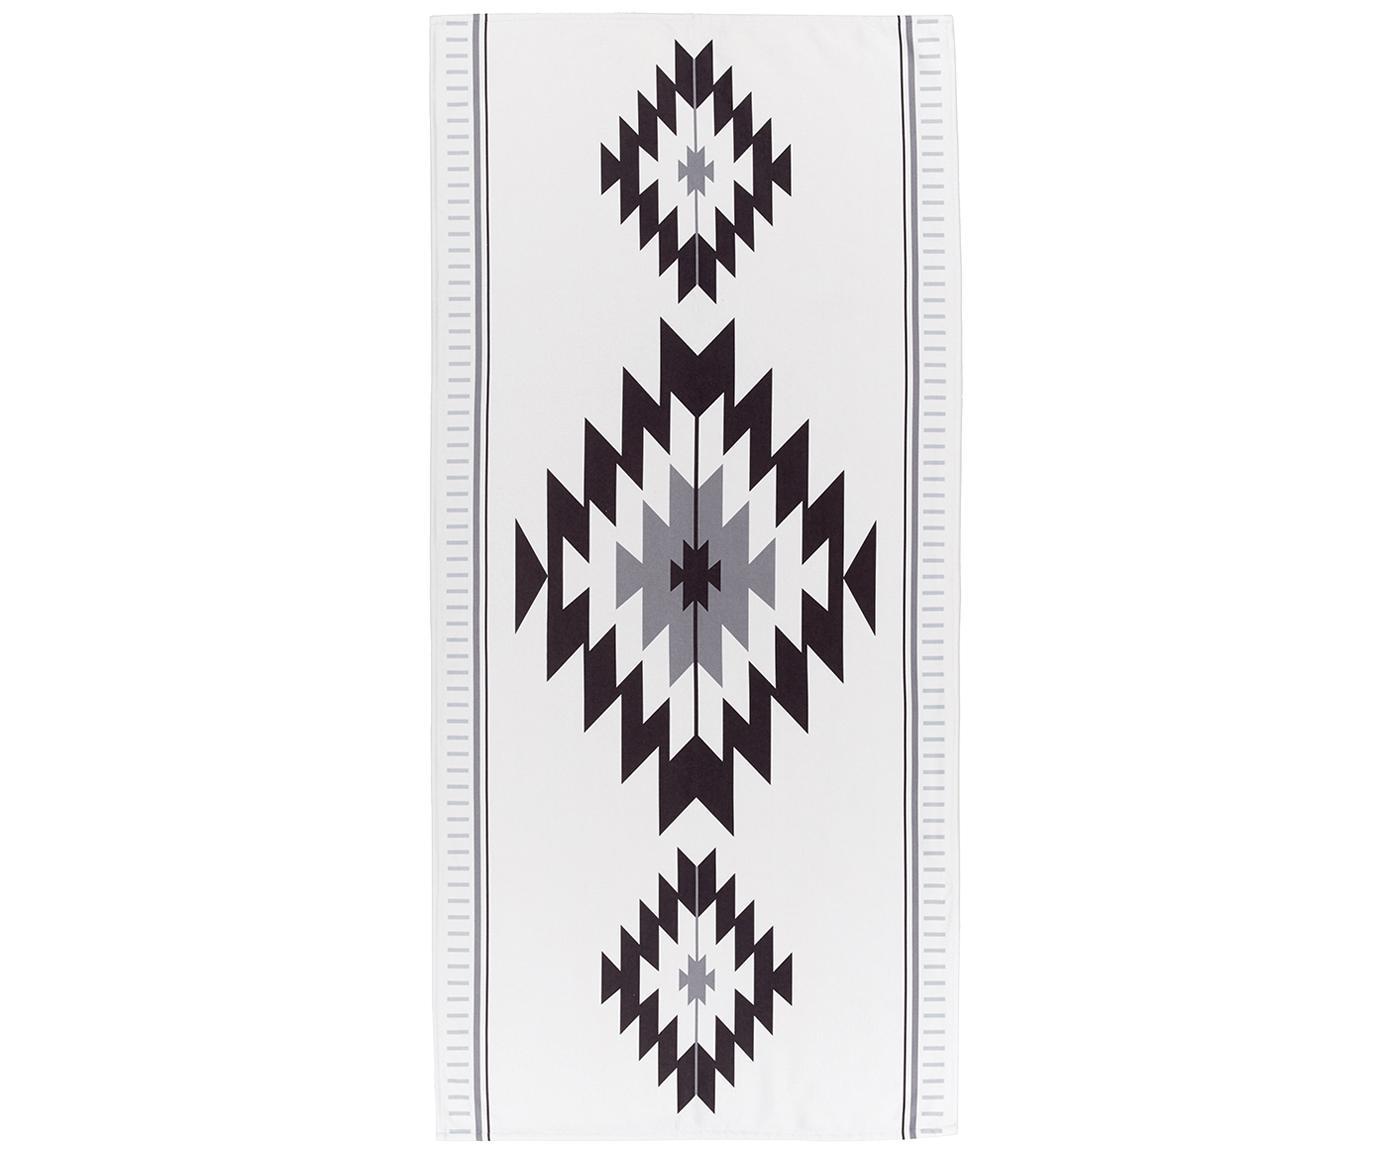 Licht strandlaken Ikat in ethno stijl, 55% polyester, 45% katoen zeer lichte kwaliteit, 340 g/m², Crèmekleurig, zwart, grijs, 70 x 150 cm